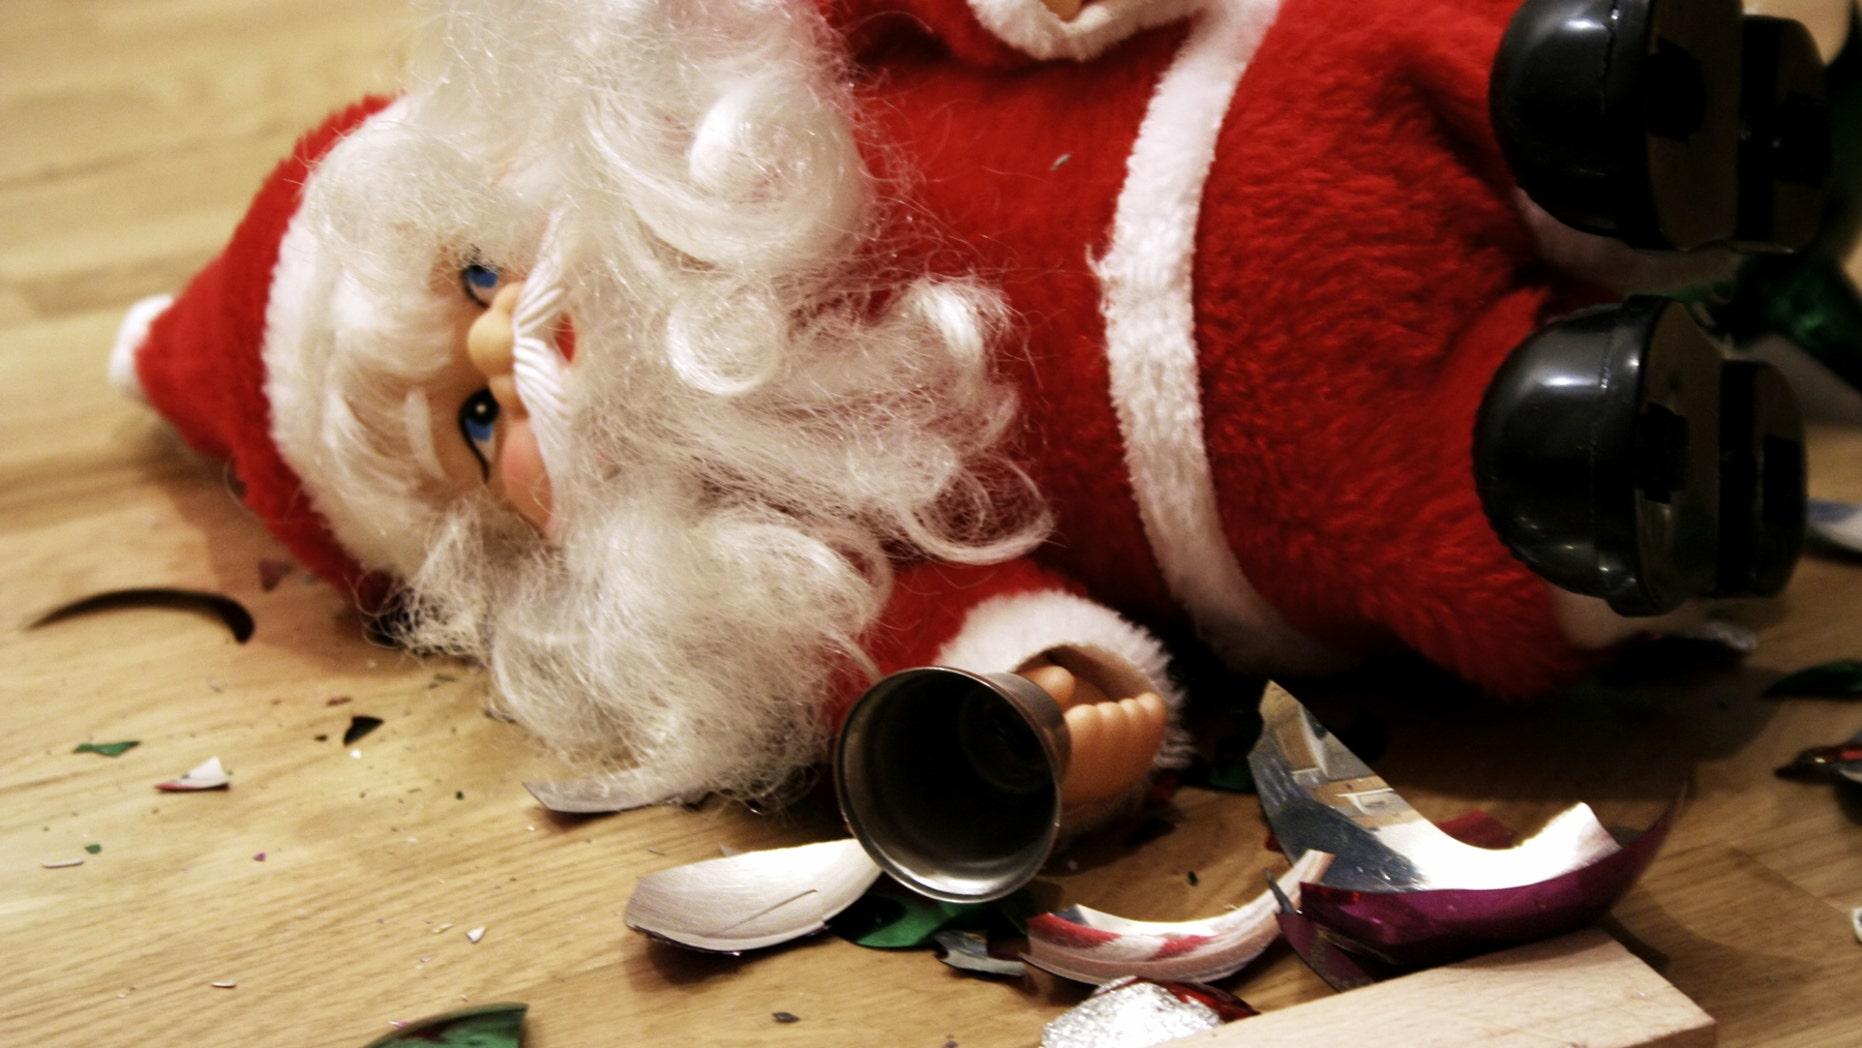 A Florida Christmas festival took a a negative turn on Saturday.